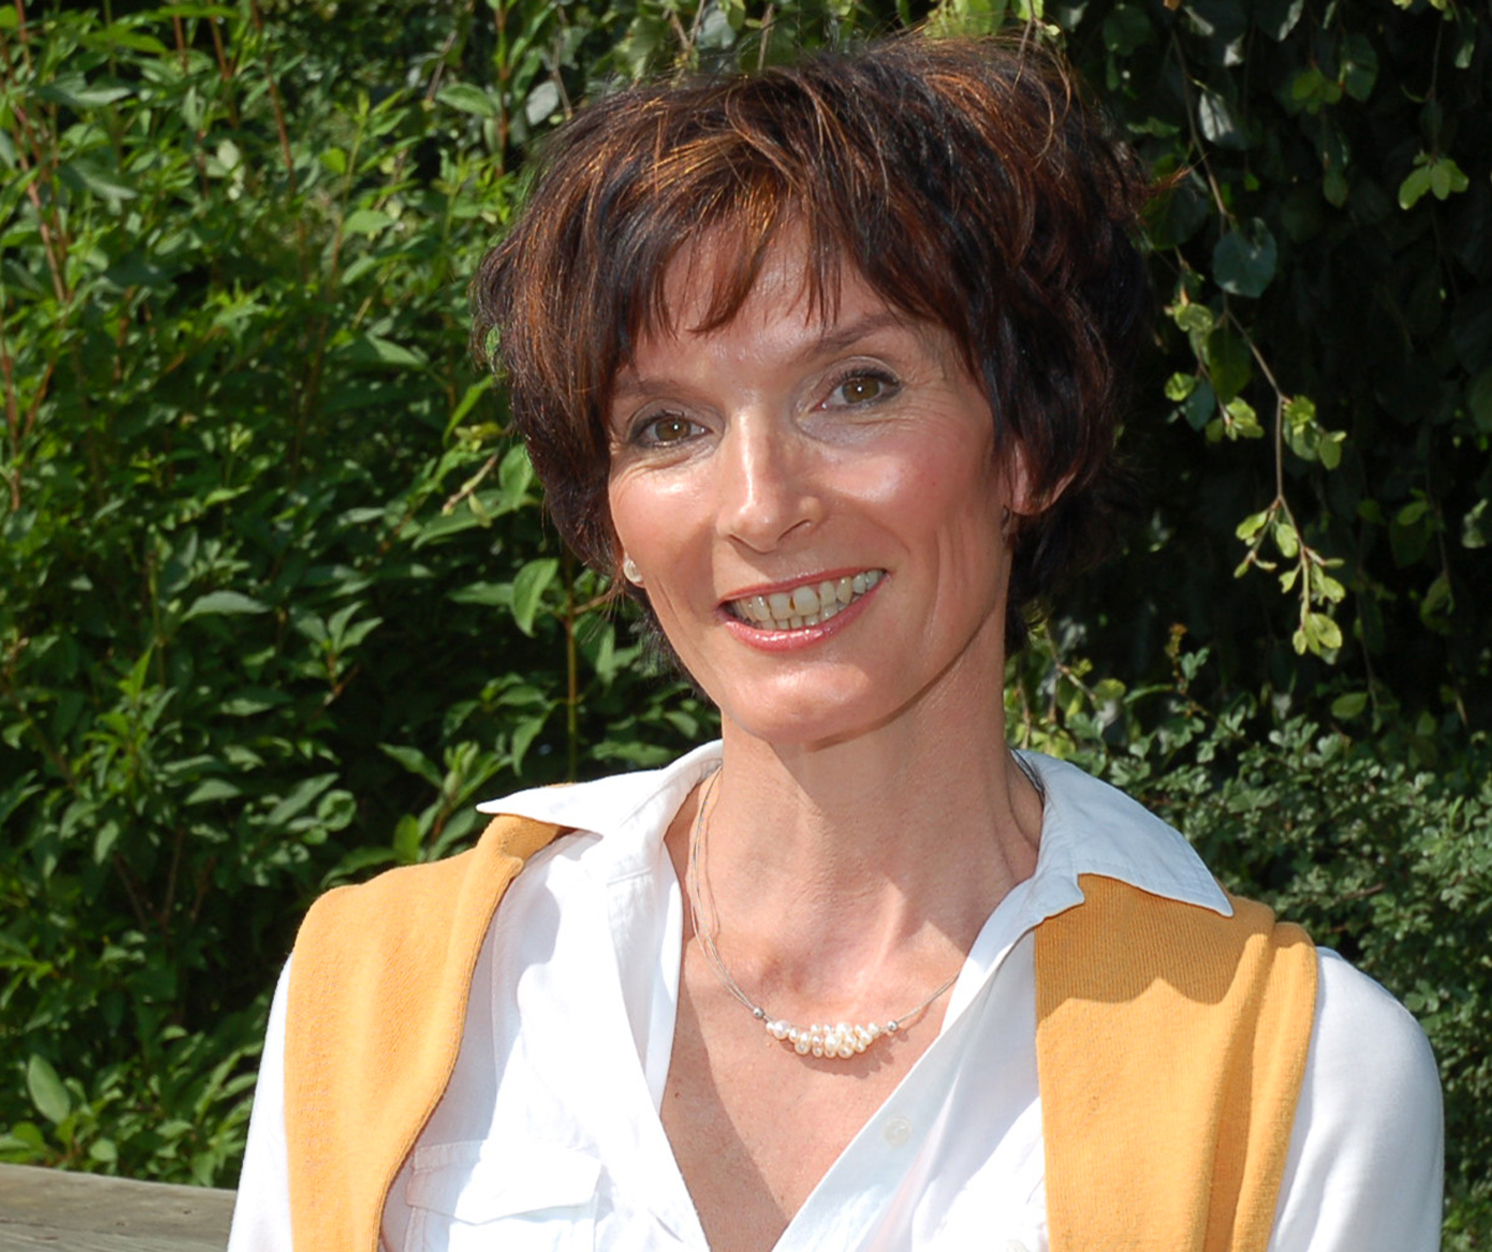 </p> <h2>Susanne Widmer</h2> <p>